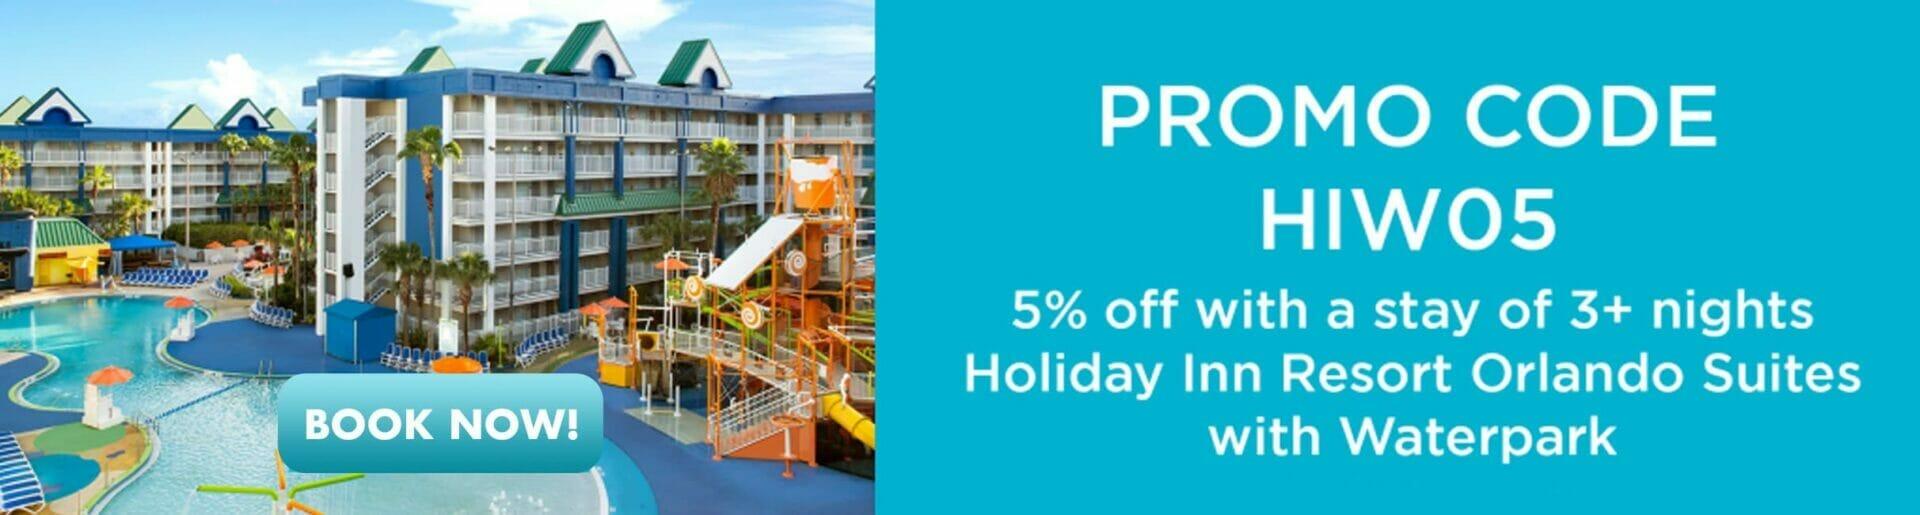 Promo Holiday Inn 5% off Orlando Vacation Discounts